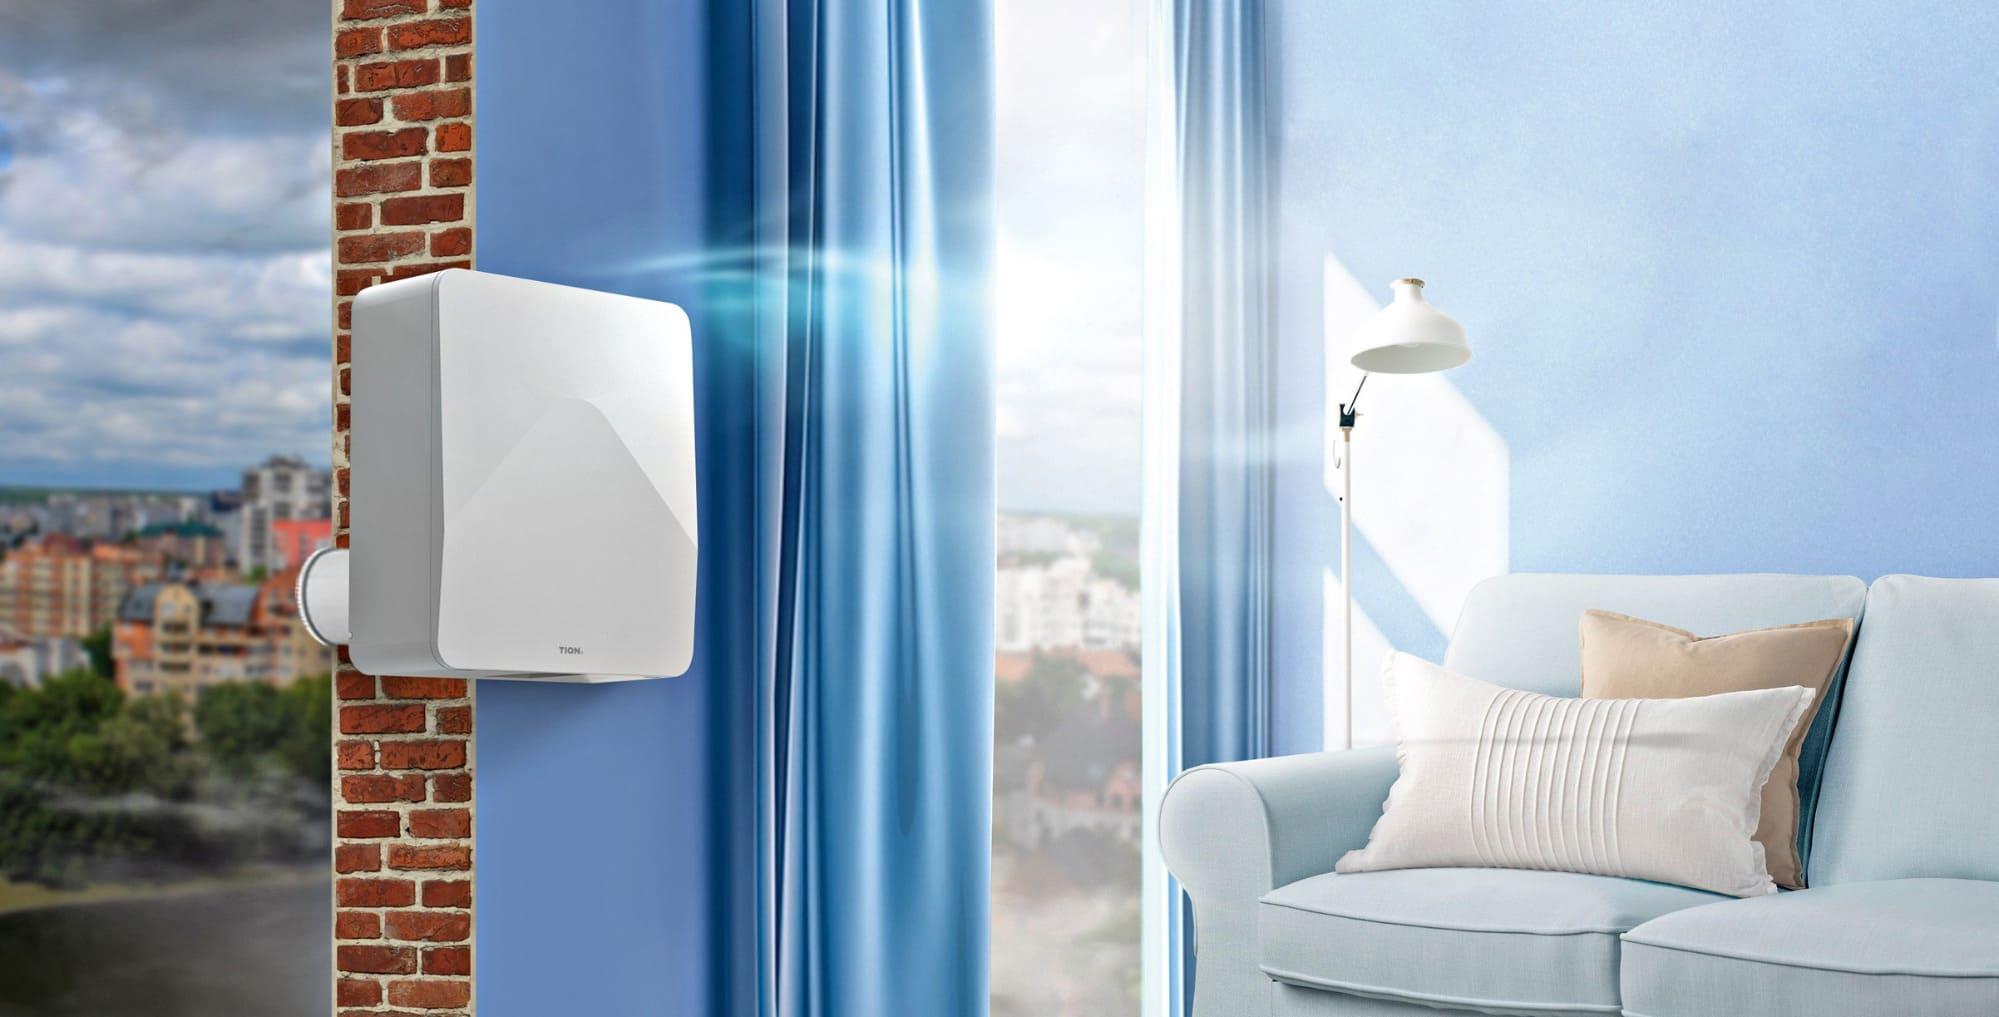 приточной вентиляции в квартире